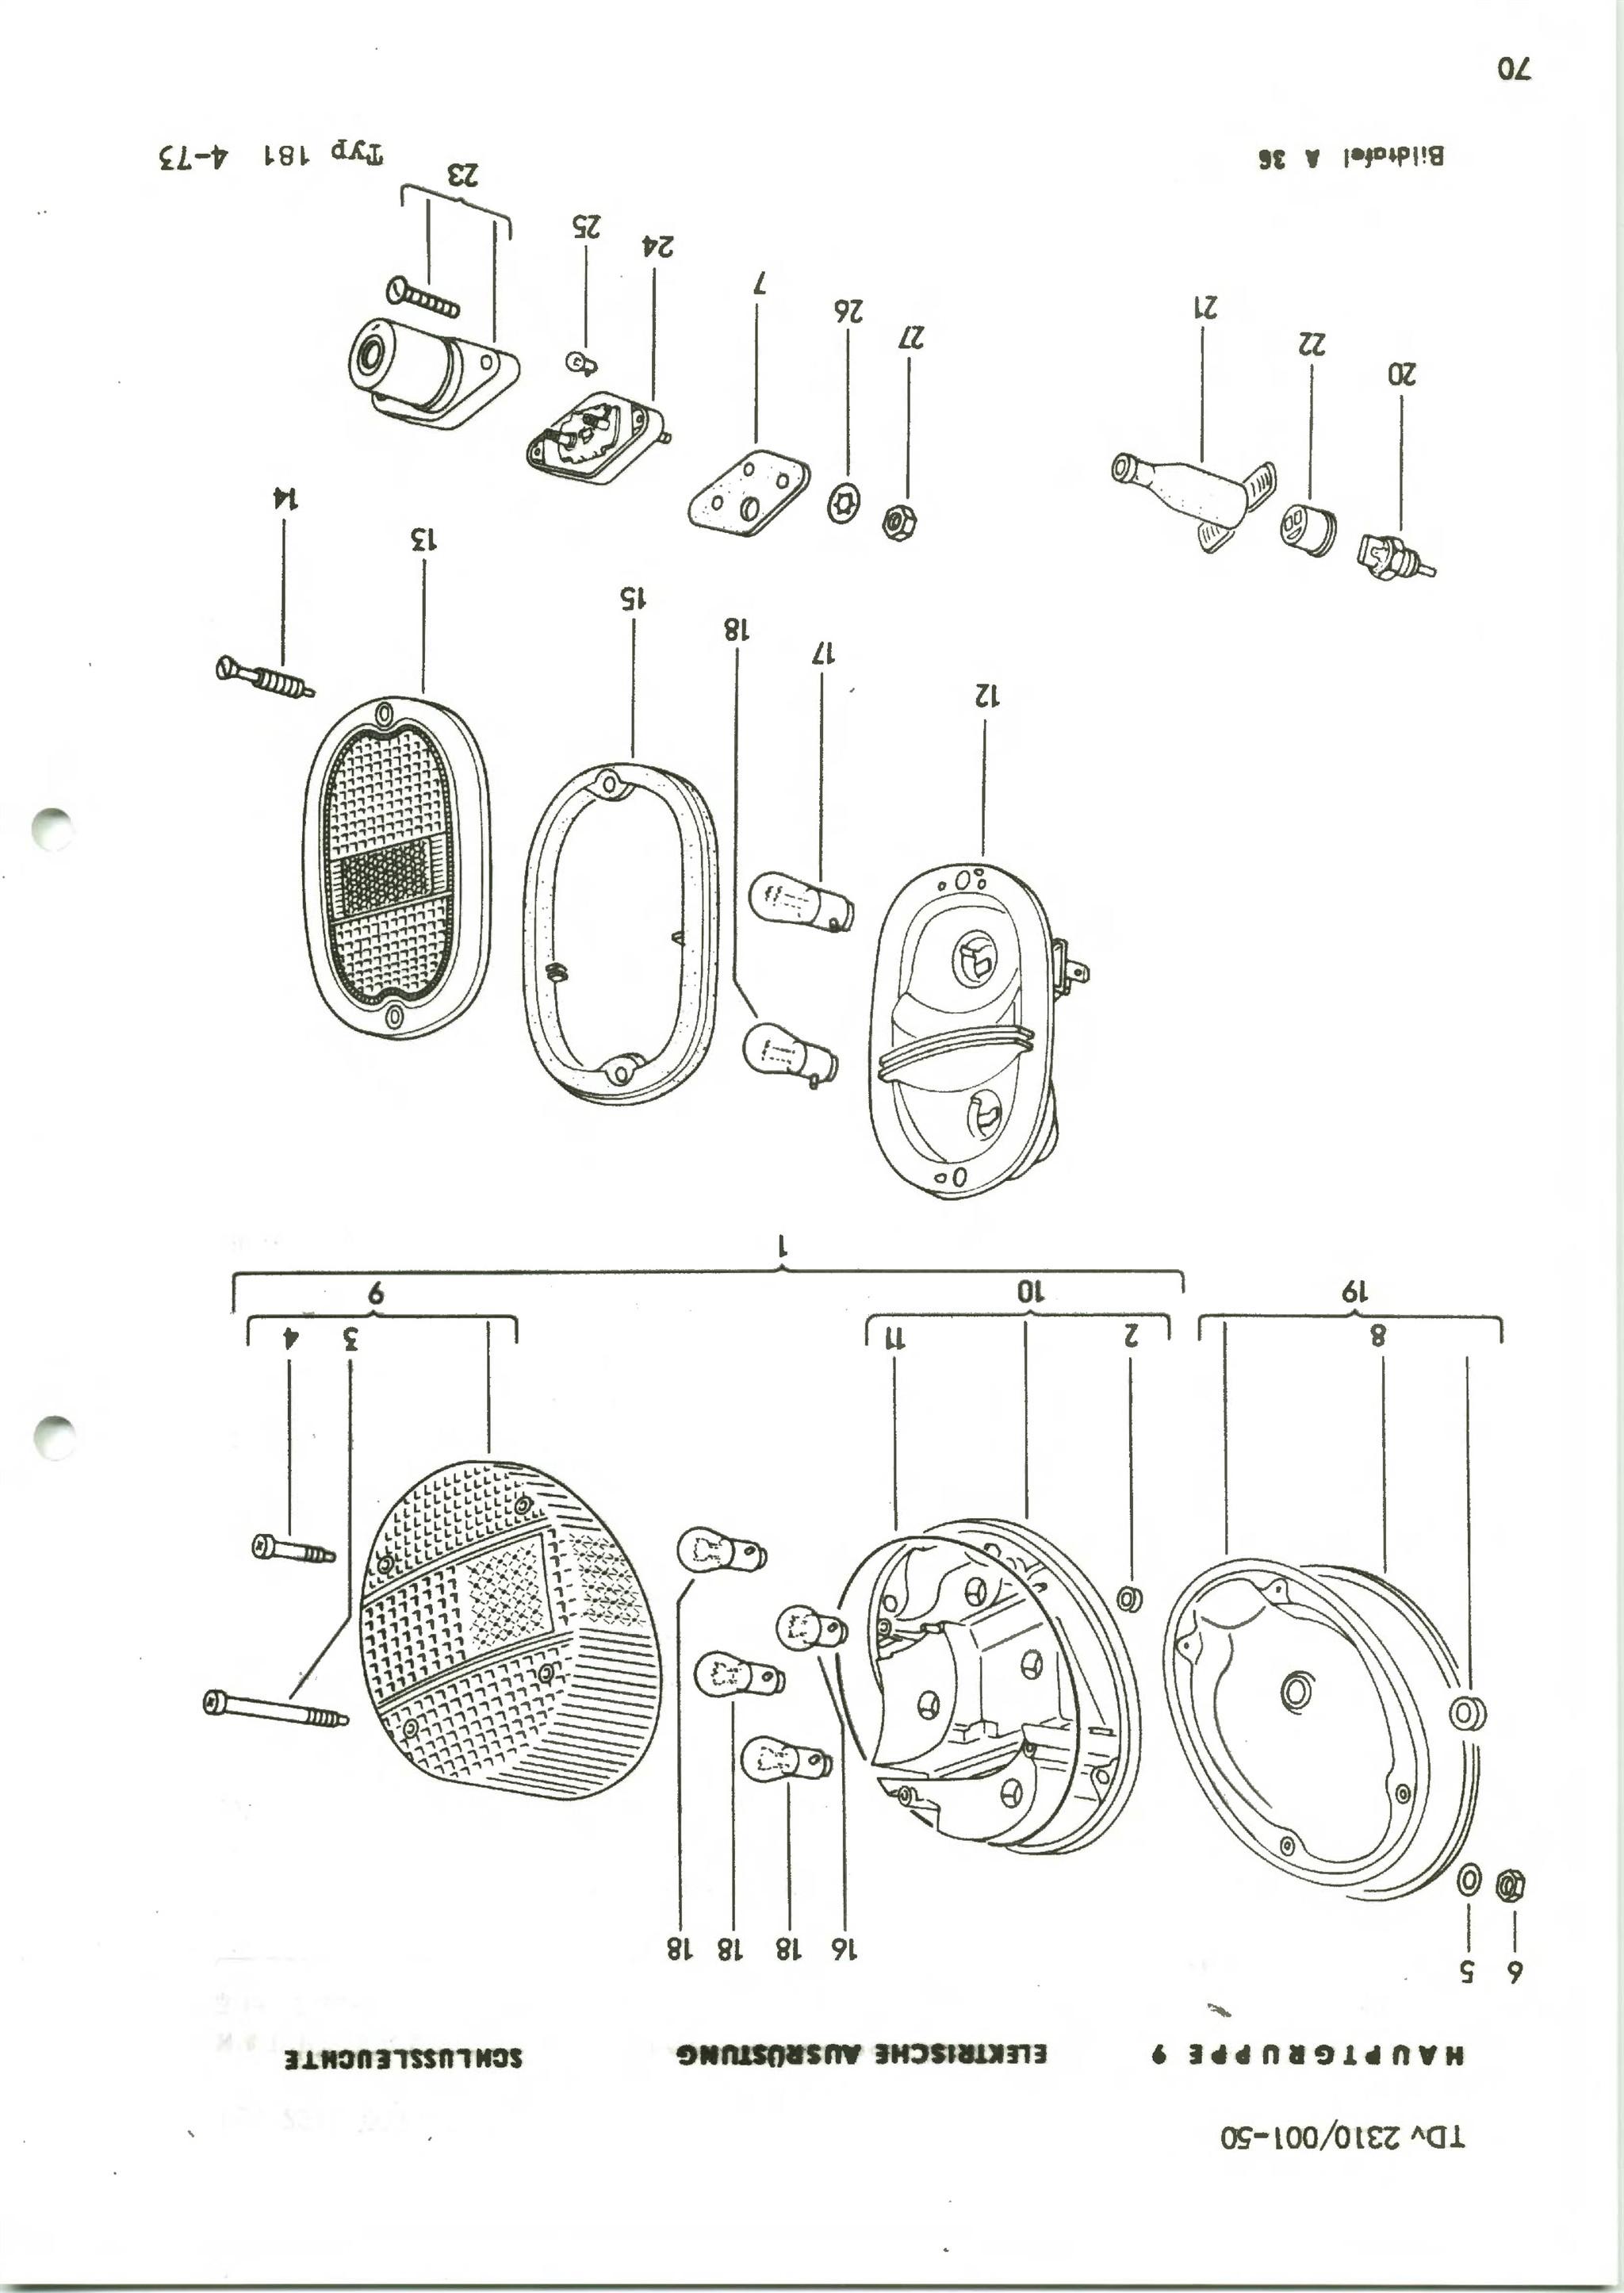 m1008 cucv glow plug wiring diagram wiring diagram